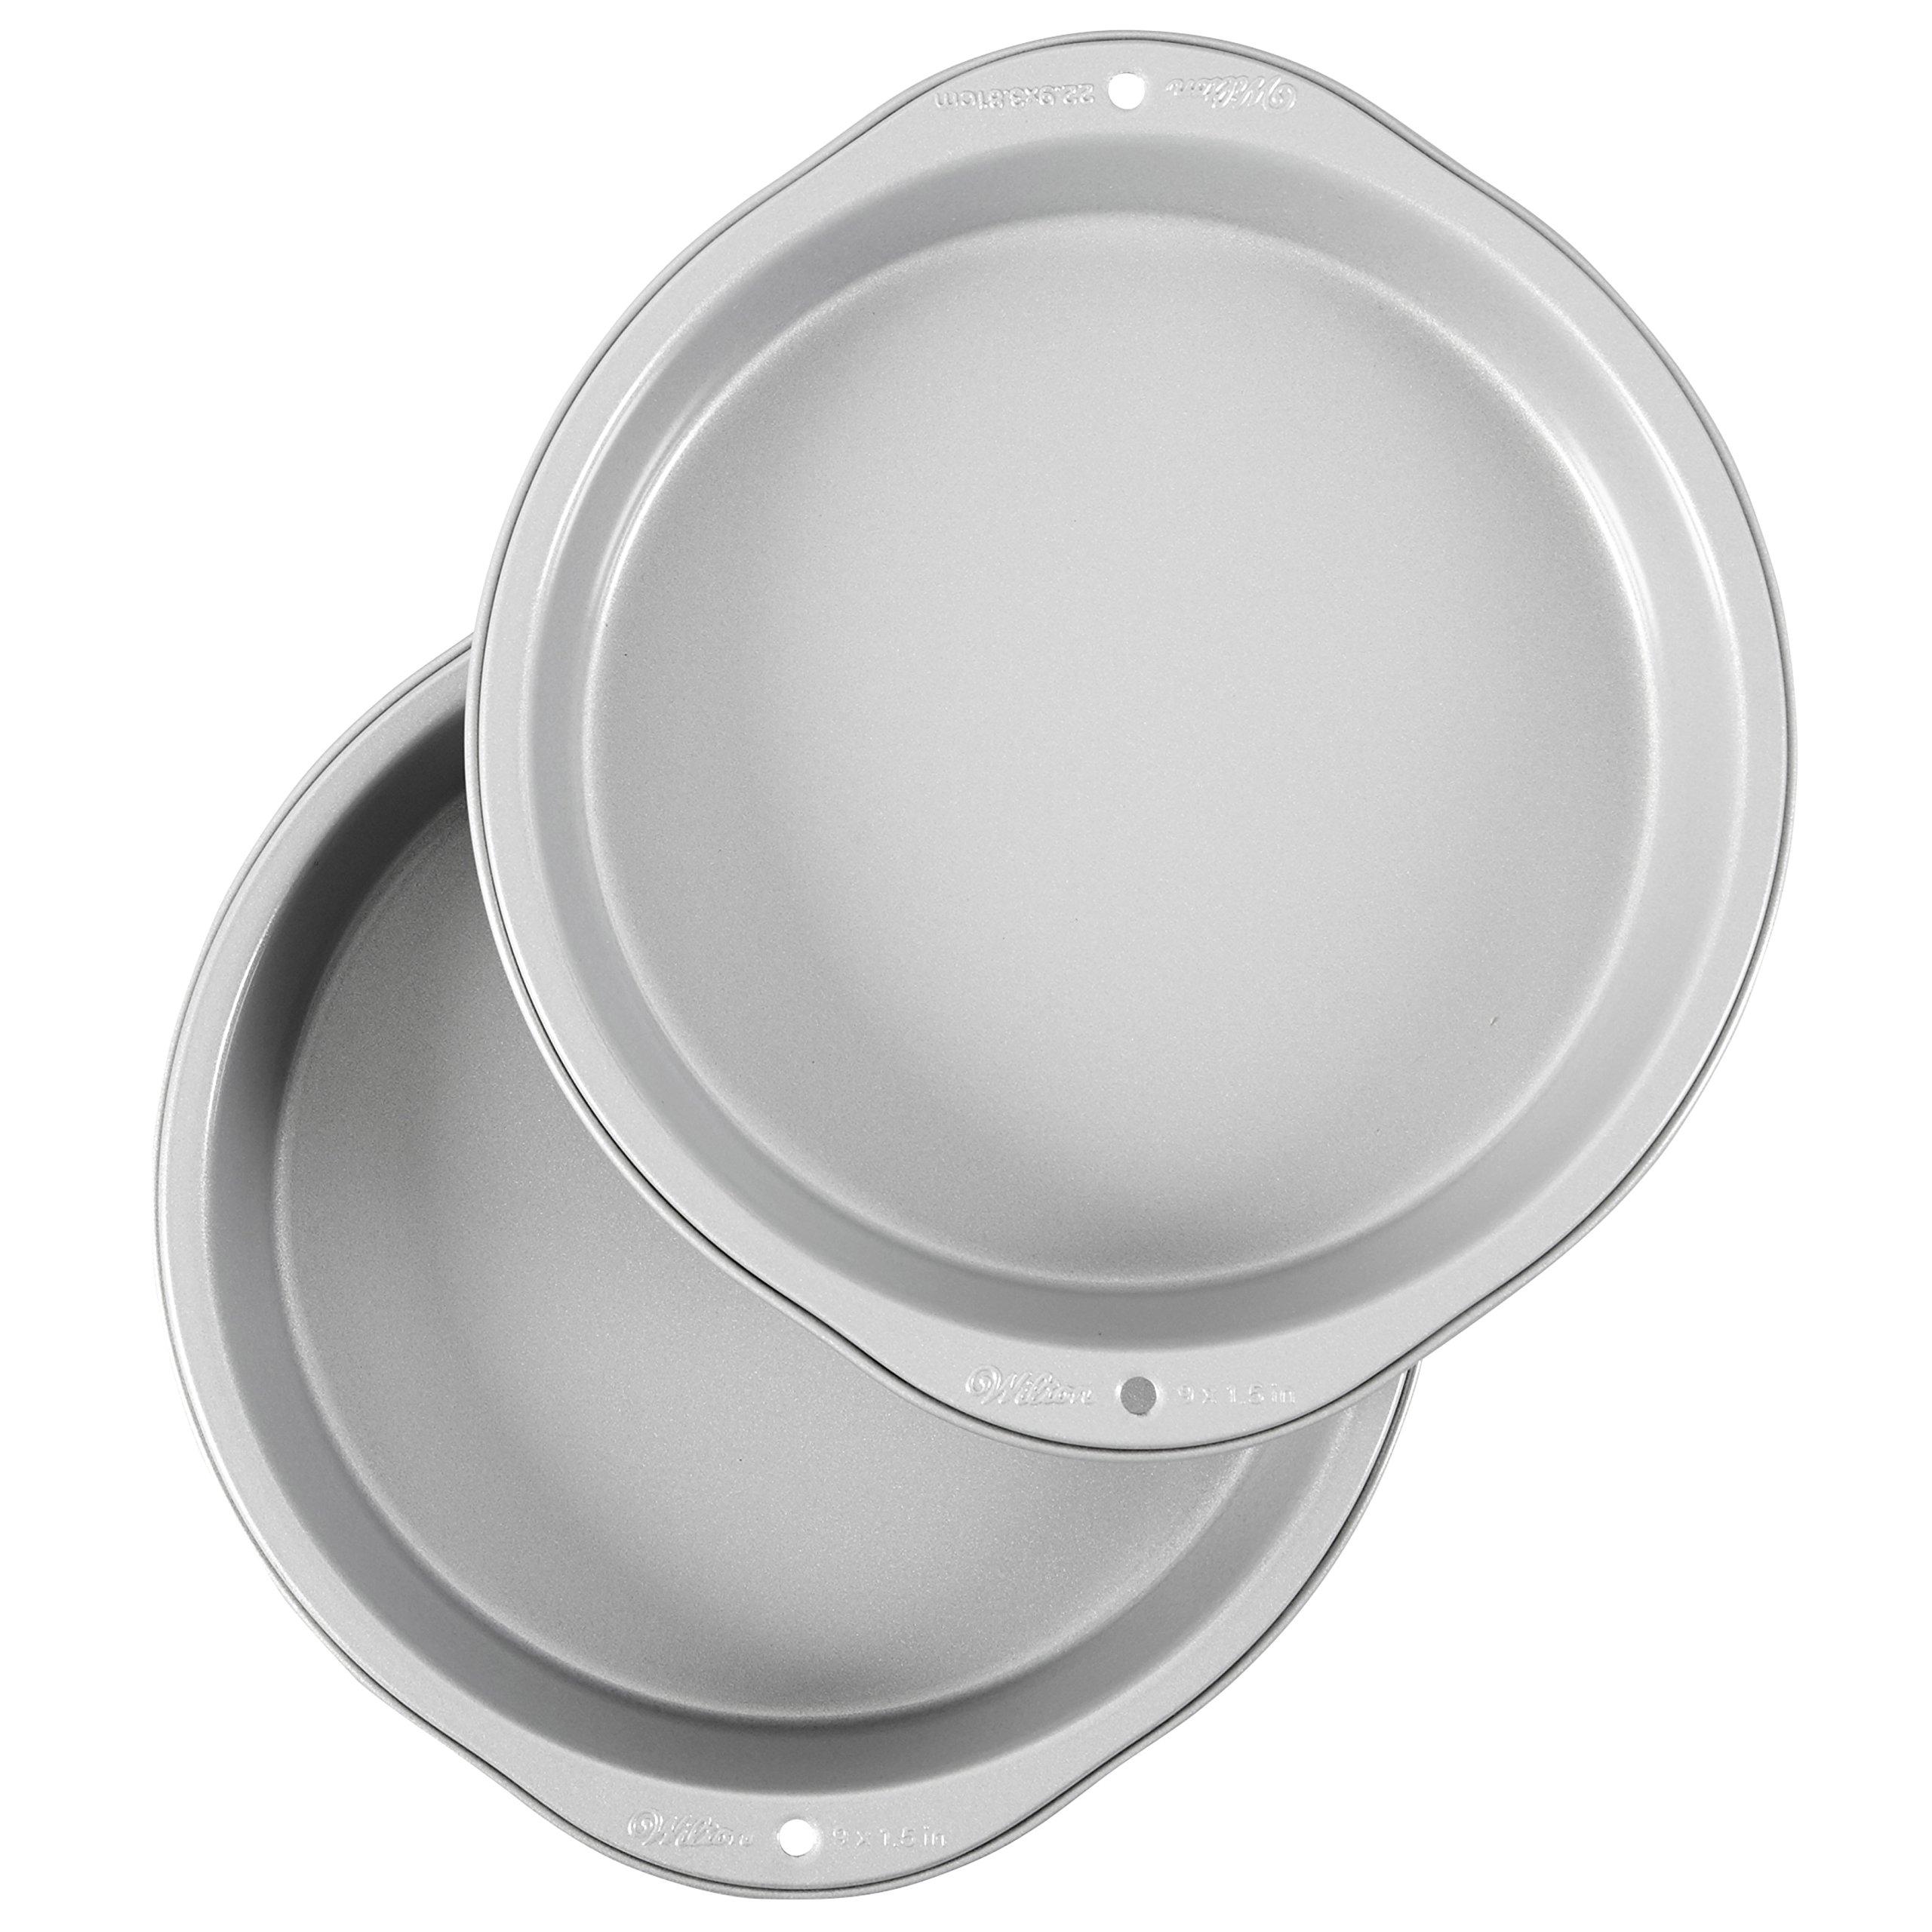 Wilton Recipe Right Non-Stick 9-Inch Round Cake Pans Set, 2-Piece by Wilton